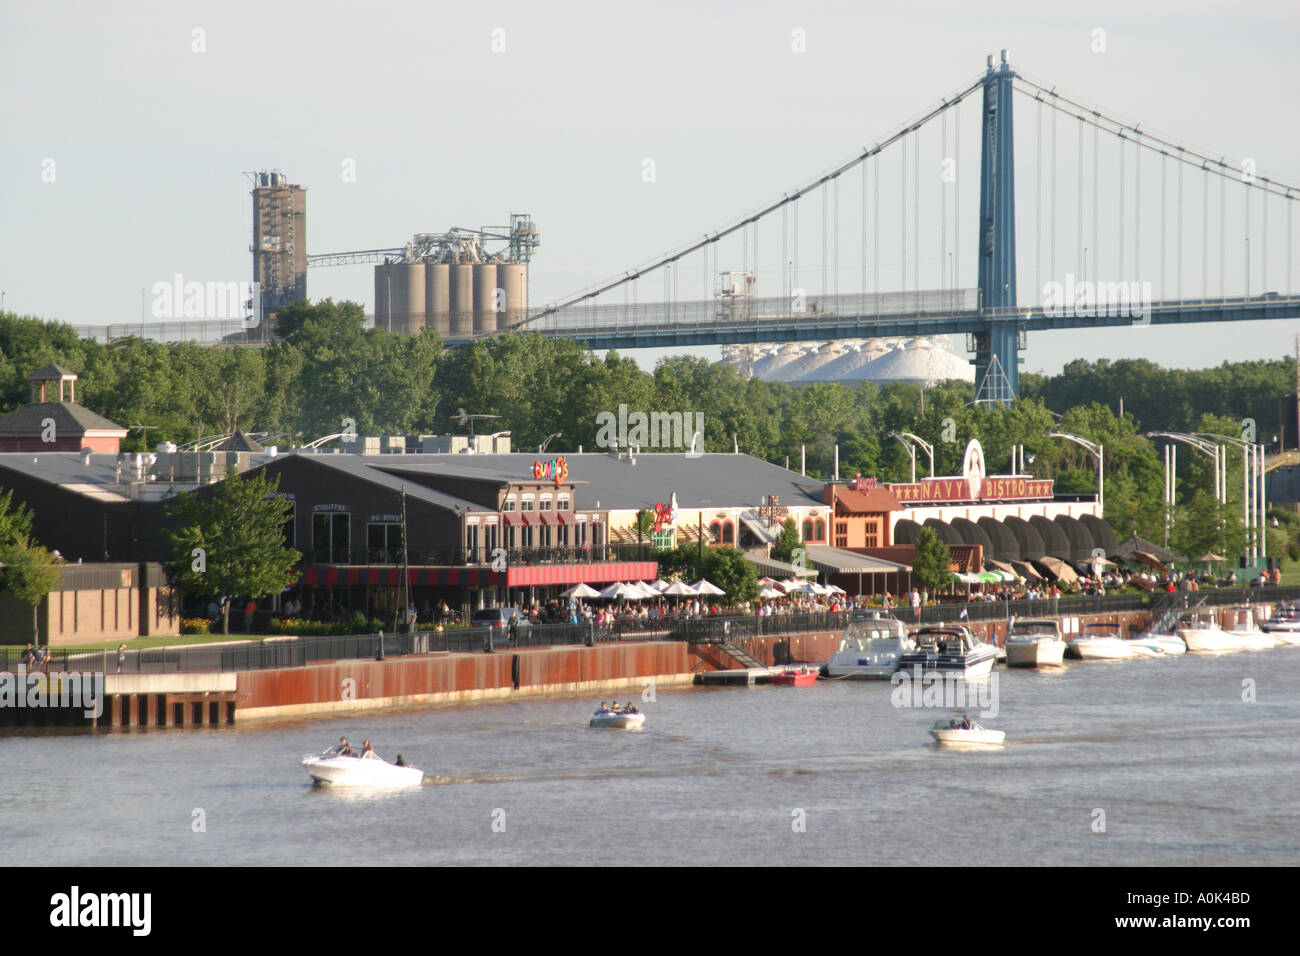 Ohio lucas county maumee - Stock Photo Toledo Ohio Maumee River The Docks High Level Bridge Boats